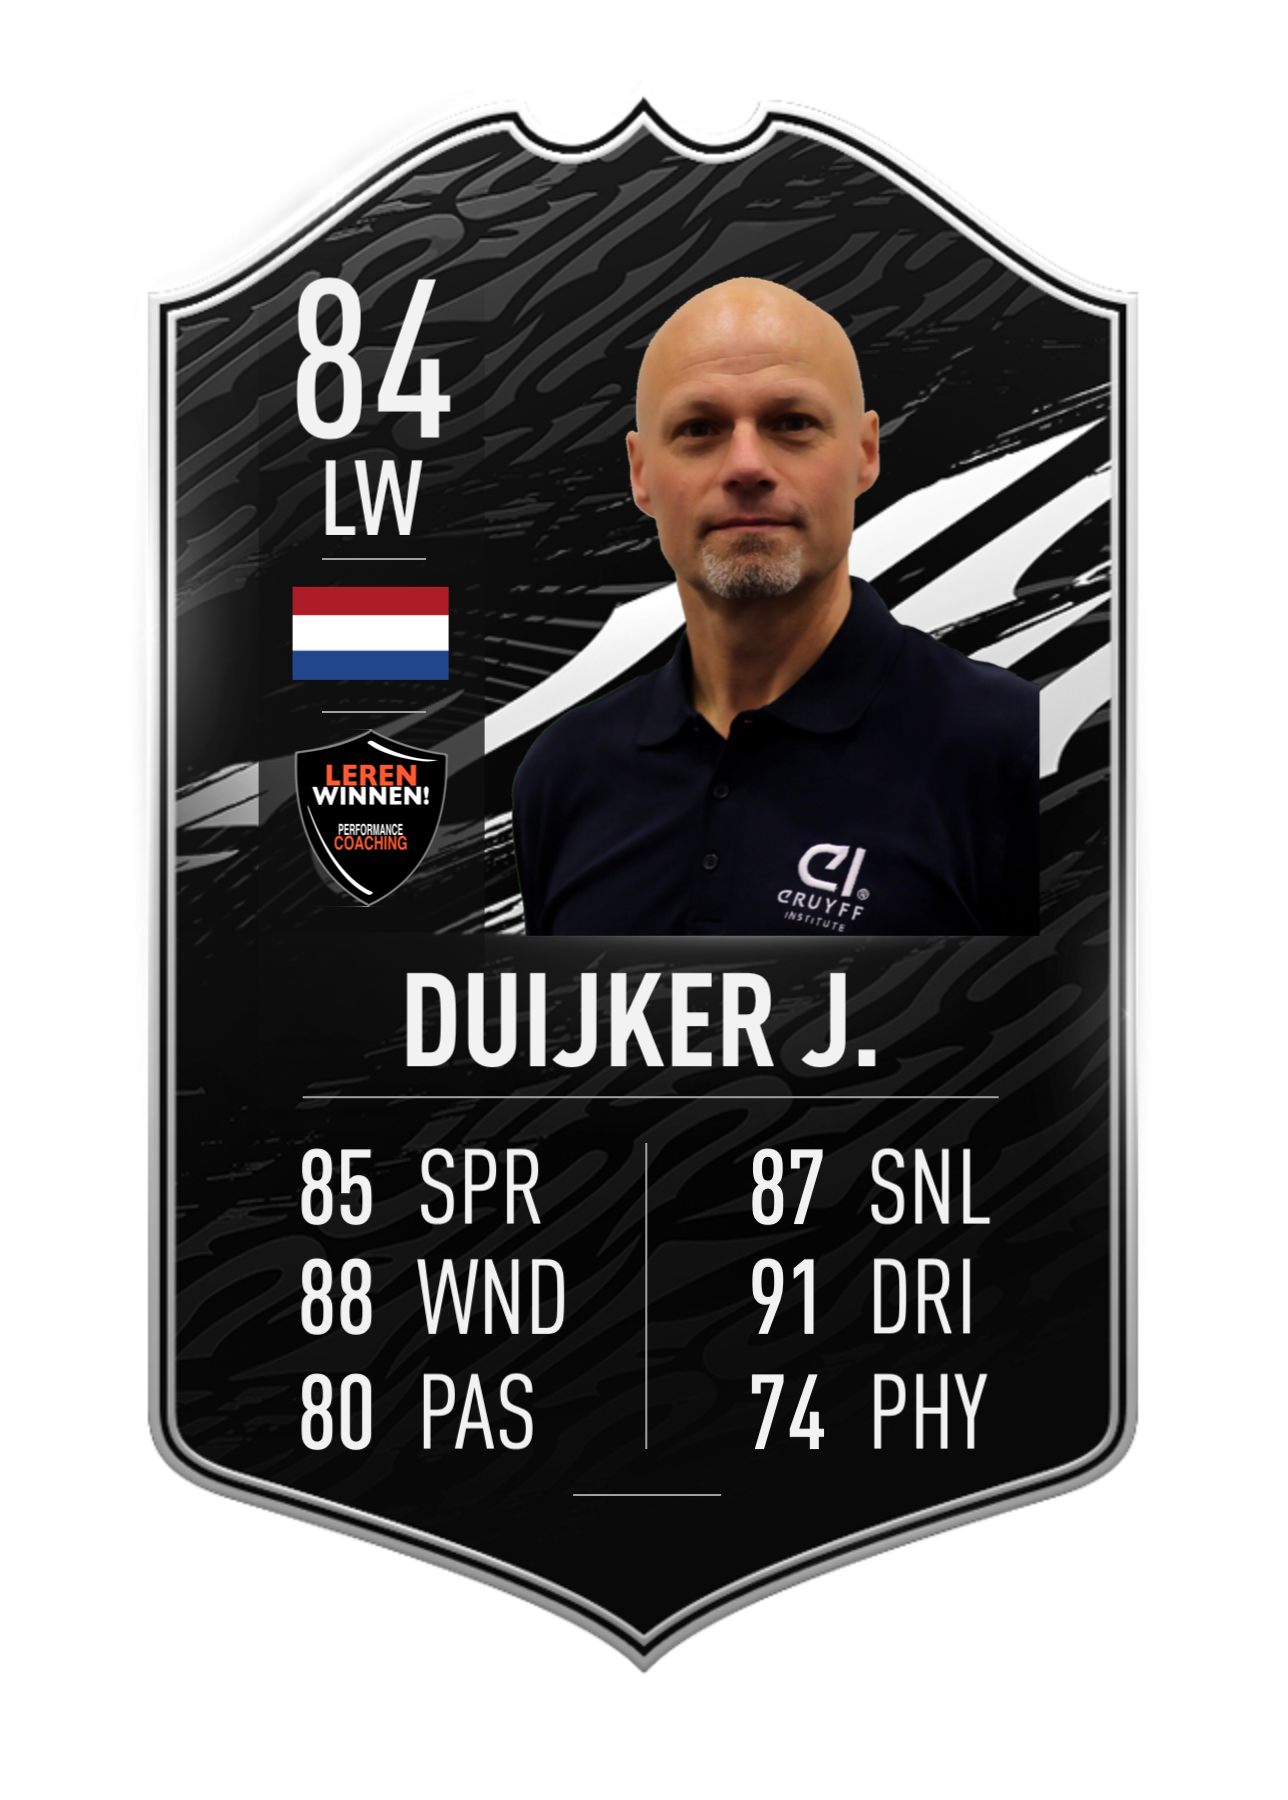 FIFA FUT card J Duijker